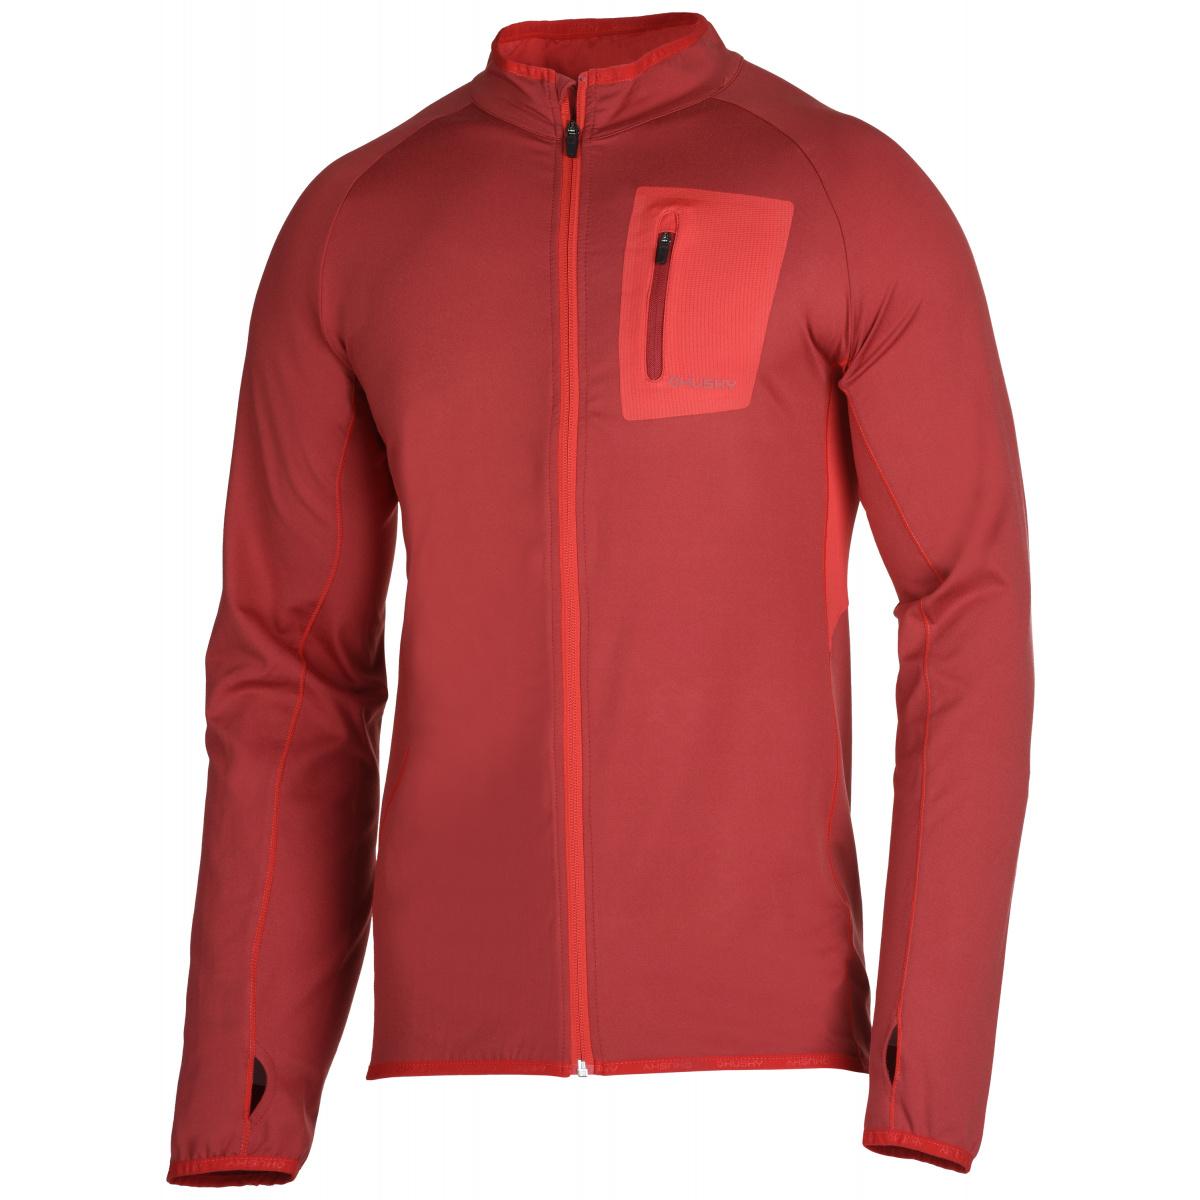 603f5a4a7b0e Pánská mikina - Tarr zip M – tm. červená